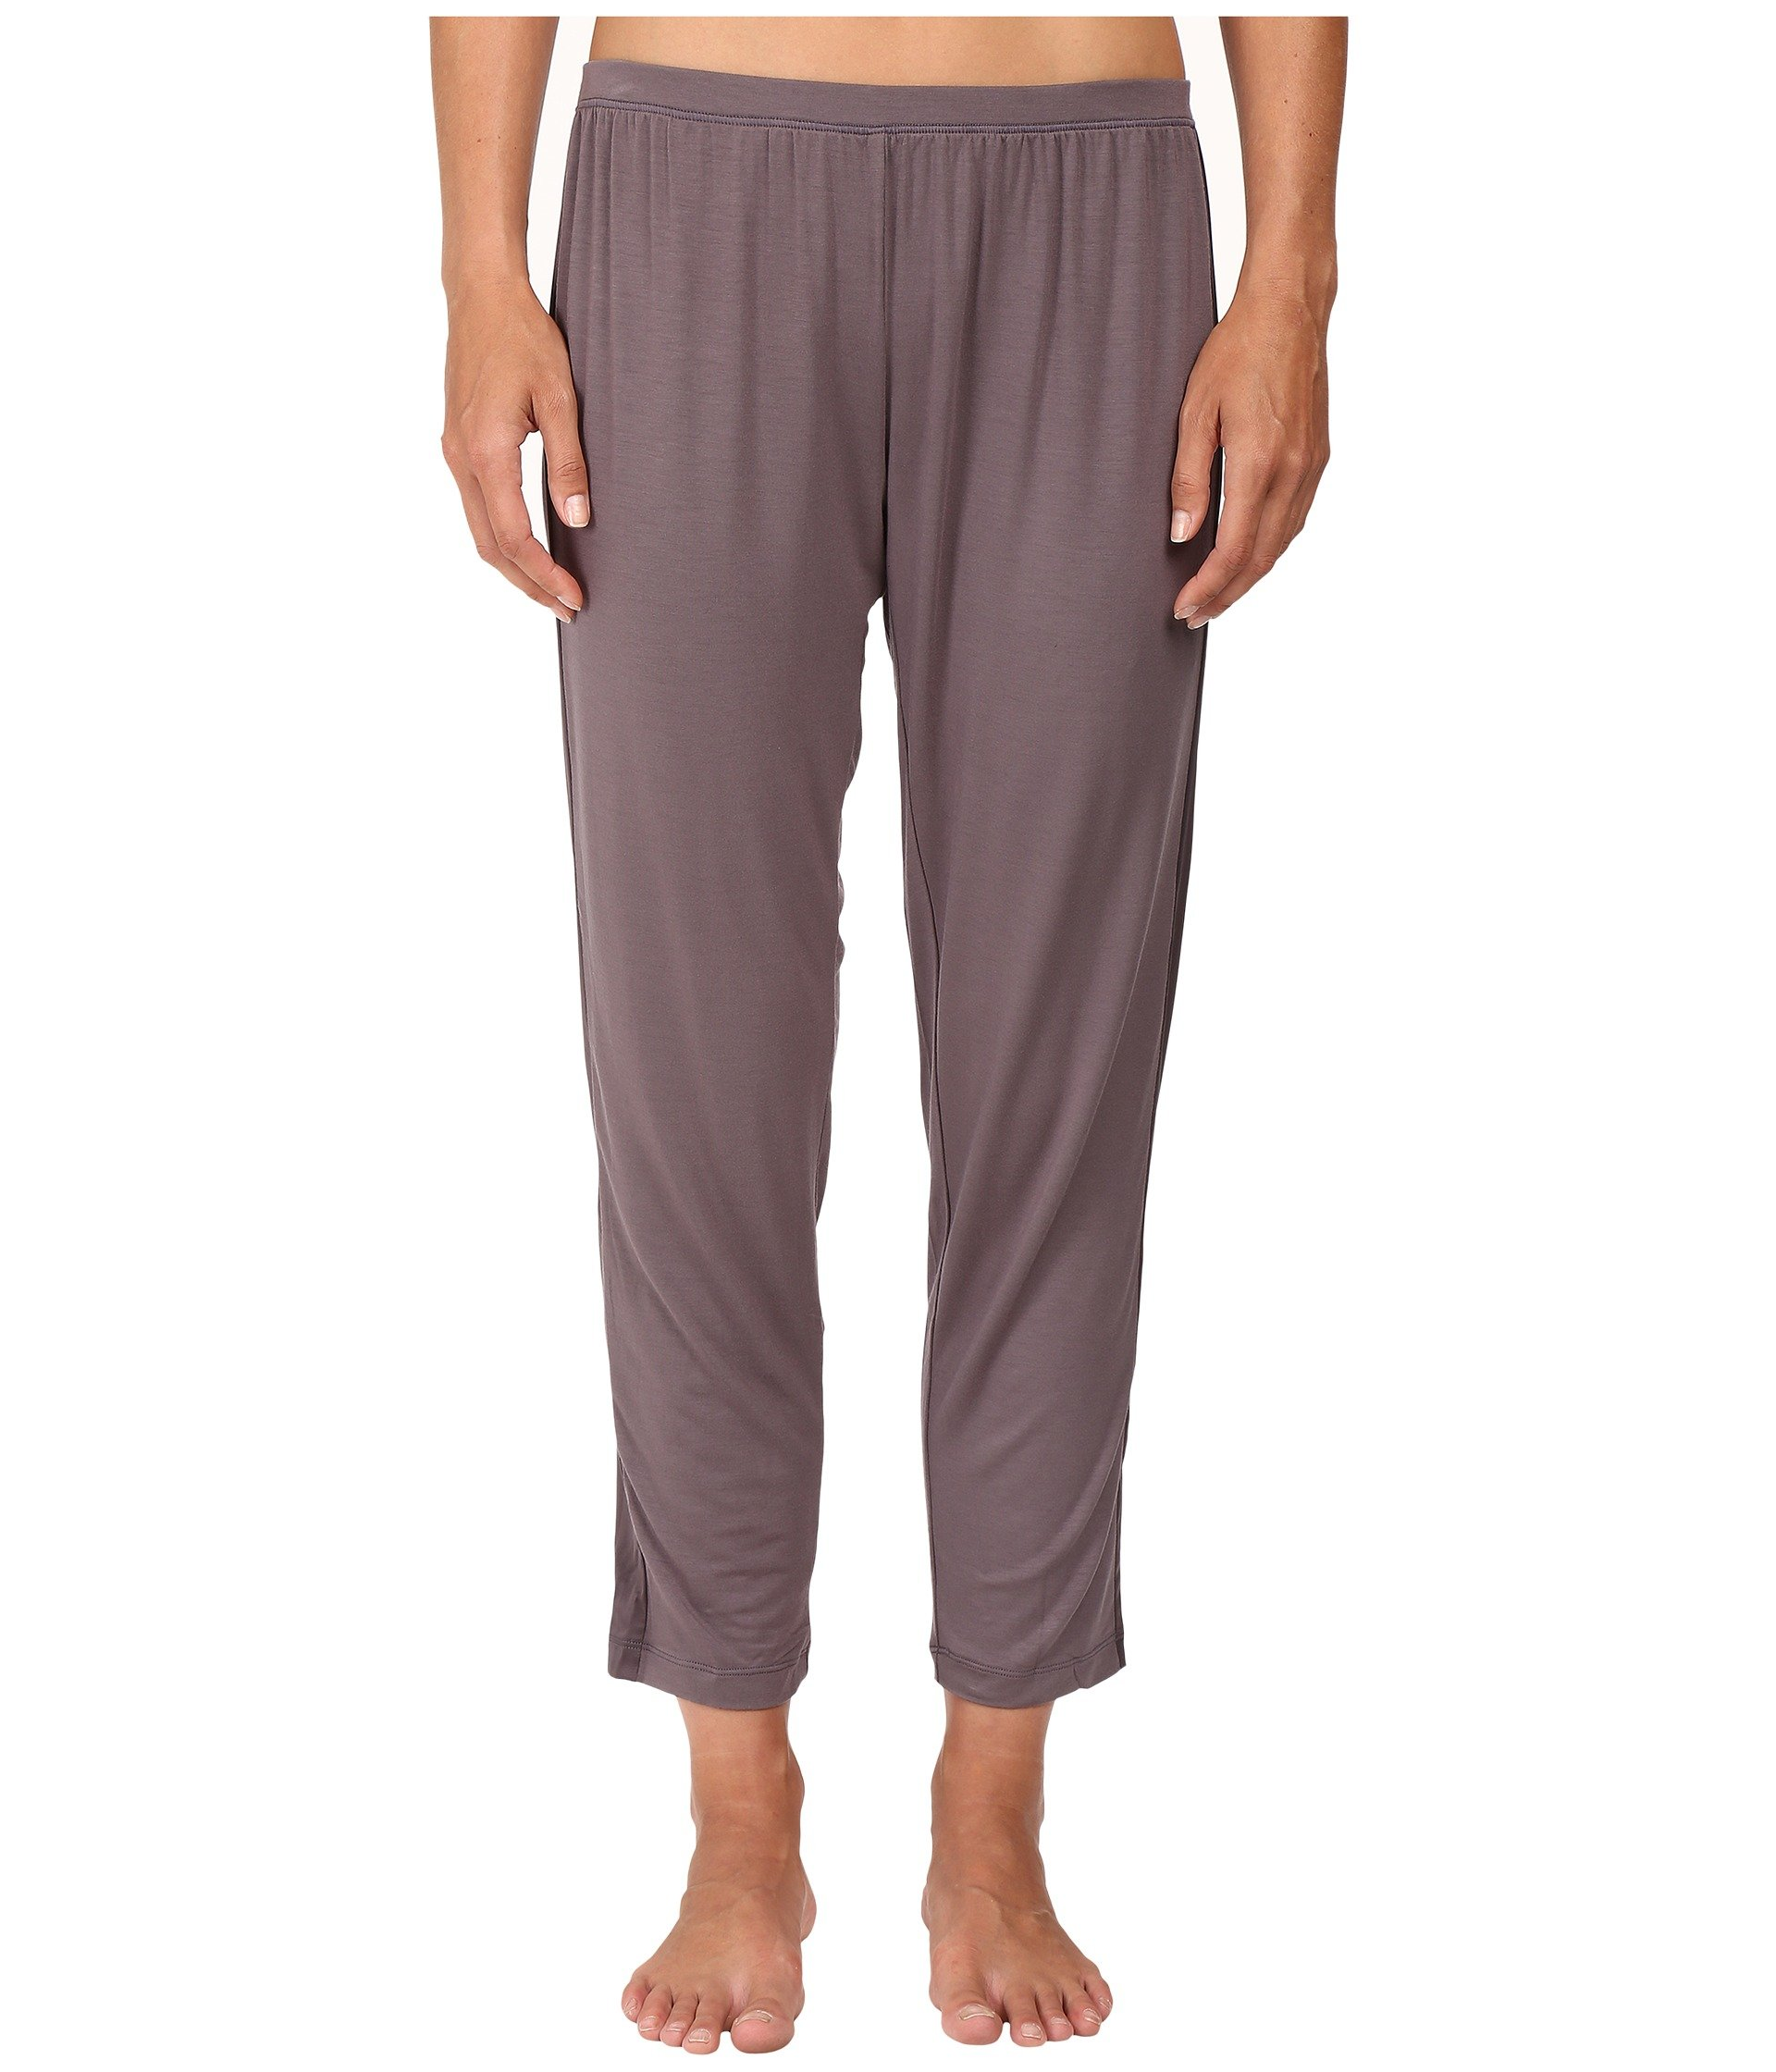 Pantalón de Pijama para Mujer Skarlett Blue Premiere Crop Pants  + Skarlett Blue en VeoyCompro.net